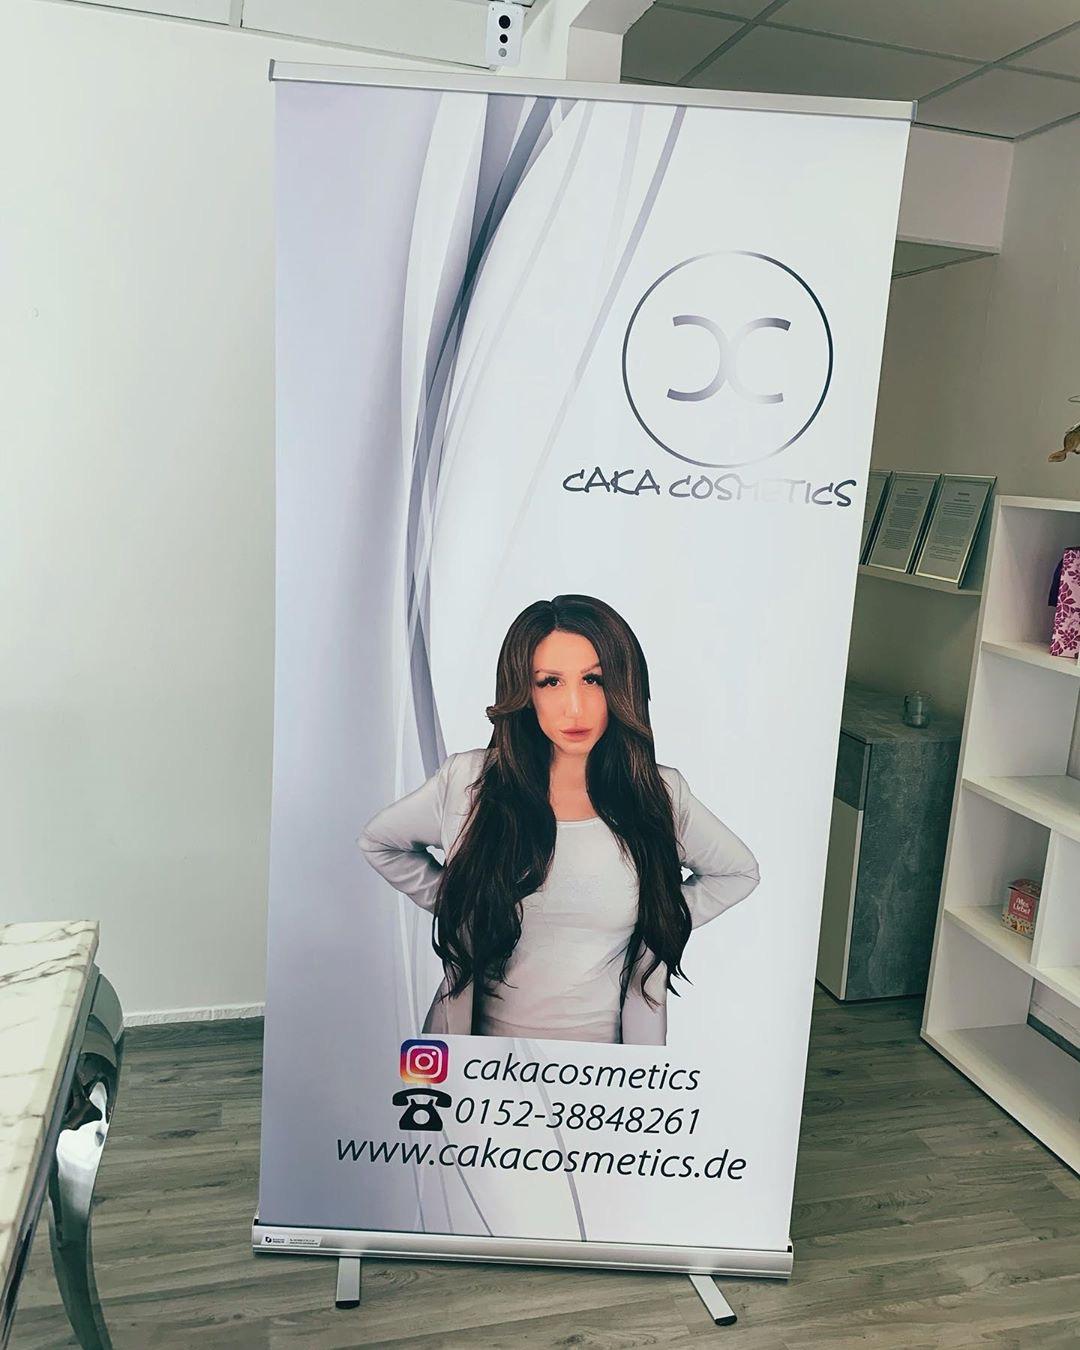 Caka Cosmetics Kosmetikfachschule Mannheim Schulungen Permanent Make-Up Microblading Wimpernlifting Gesichtsbehandlung Kosmetikstudio 1